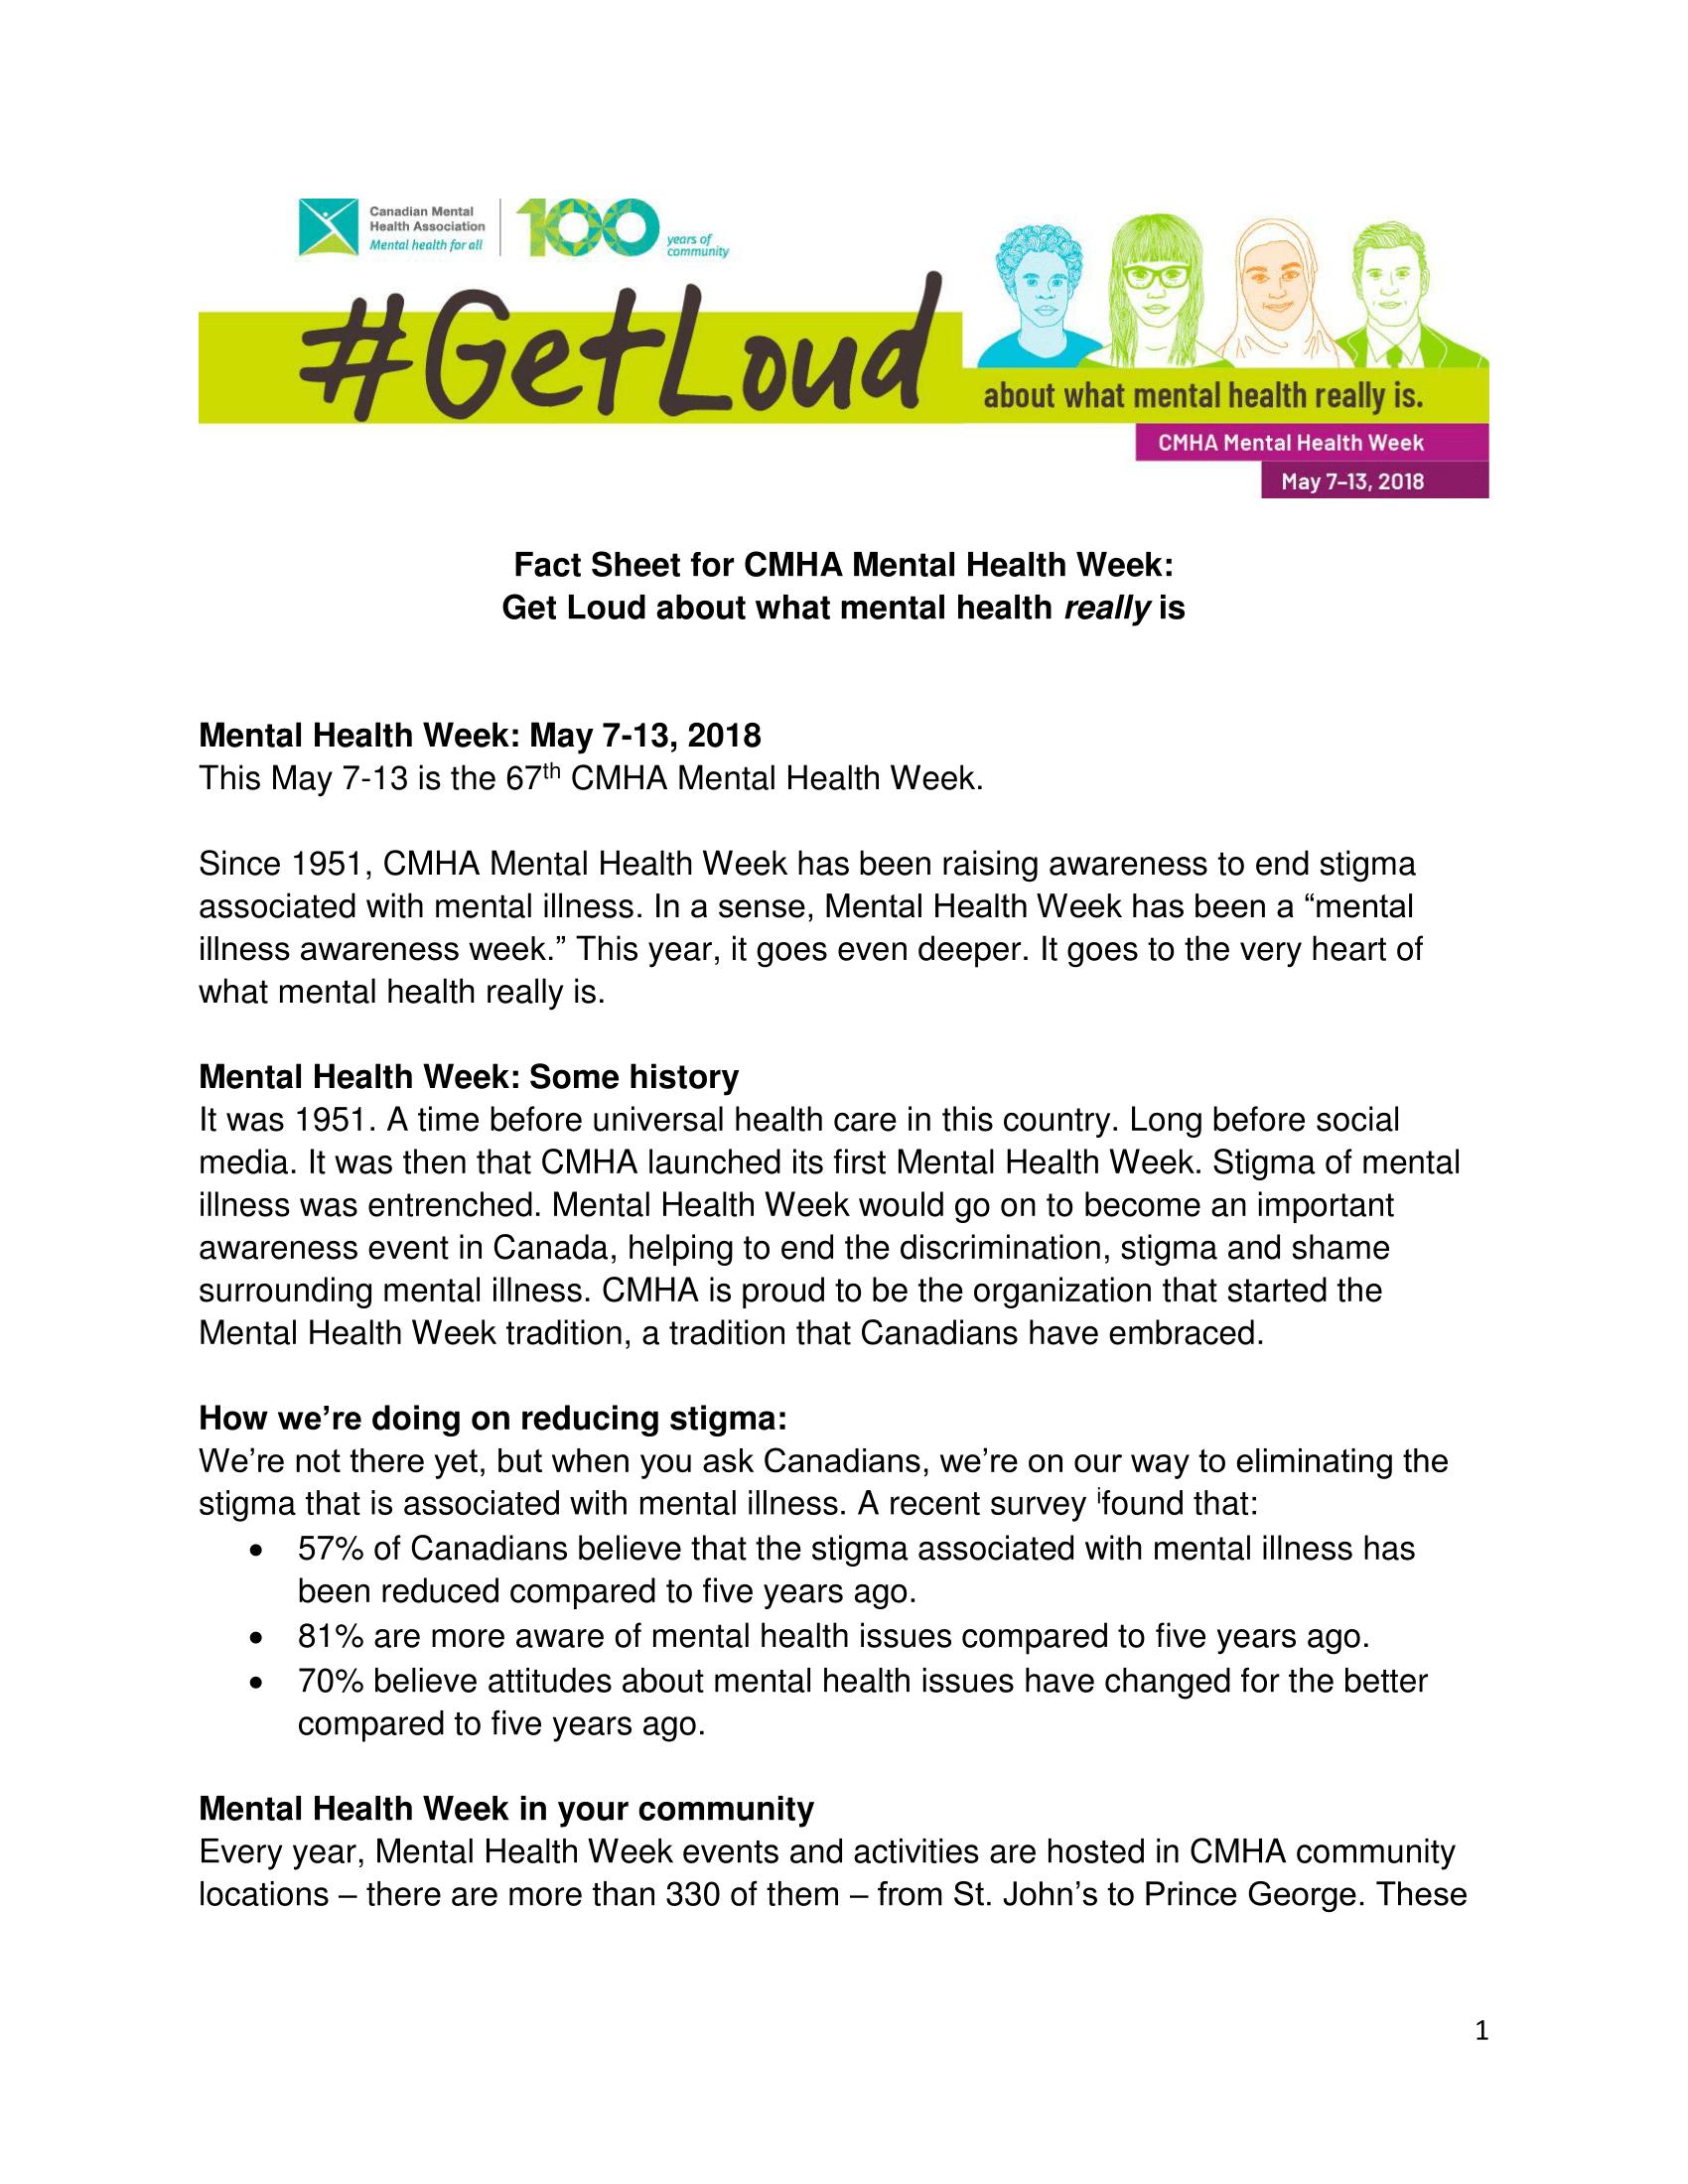 Fact Sheet For Cmha Mental Health Week Canadian Mental Health